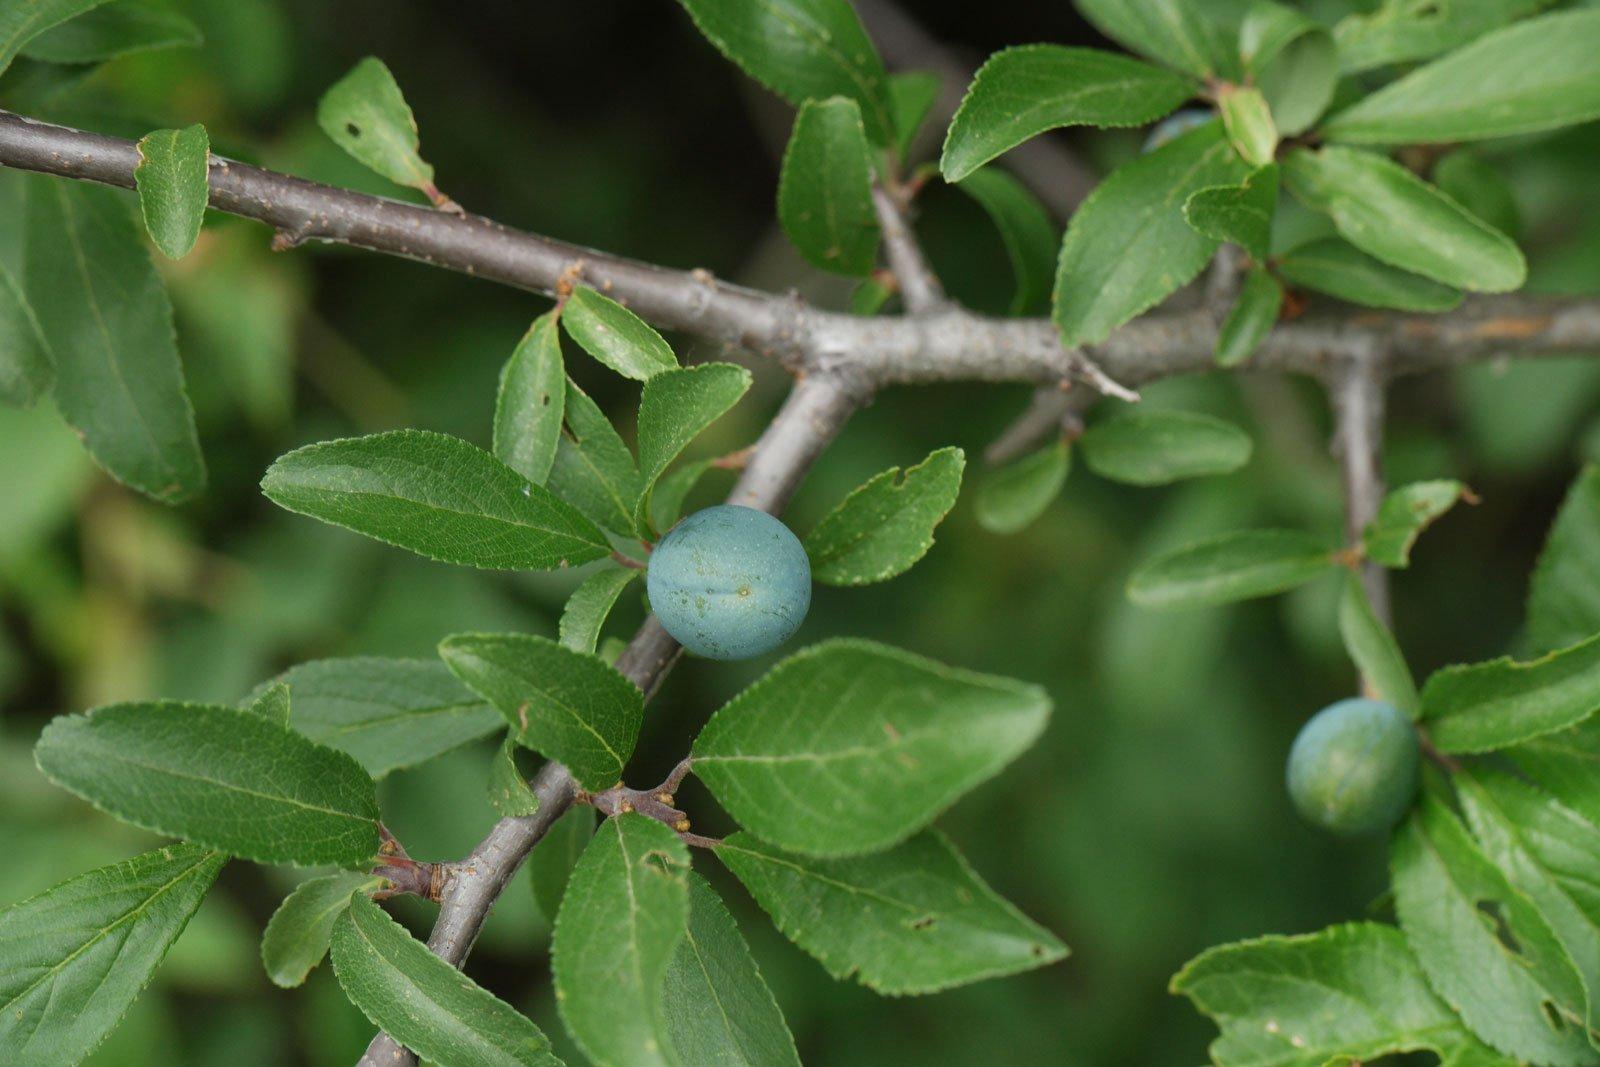 Prunus spinosa